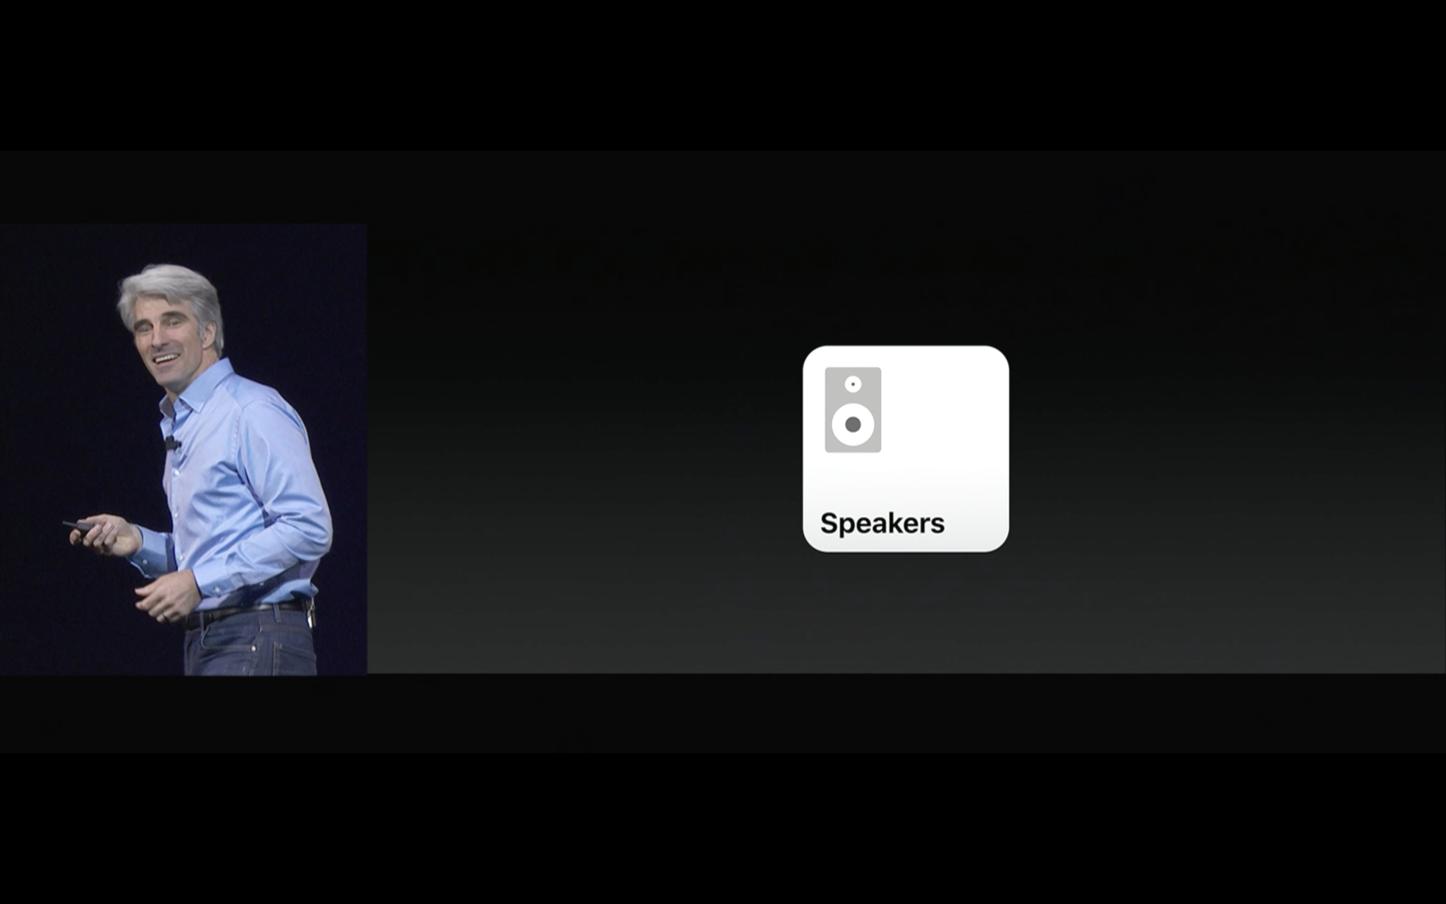 iOS11-2017-WWDC17-55.png